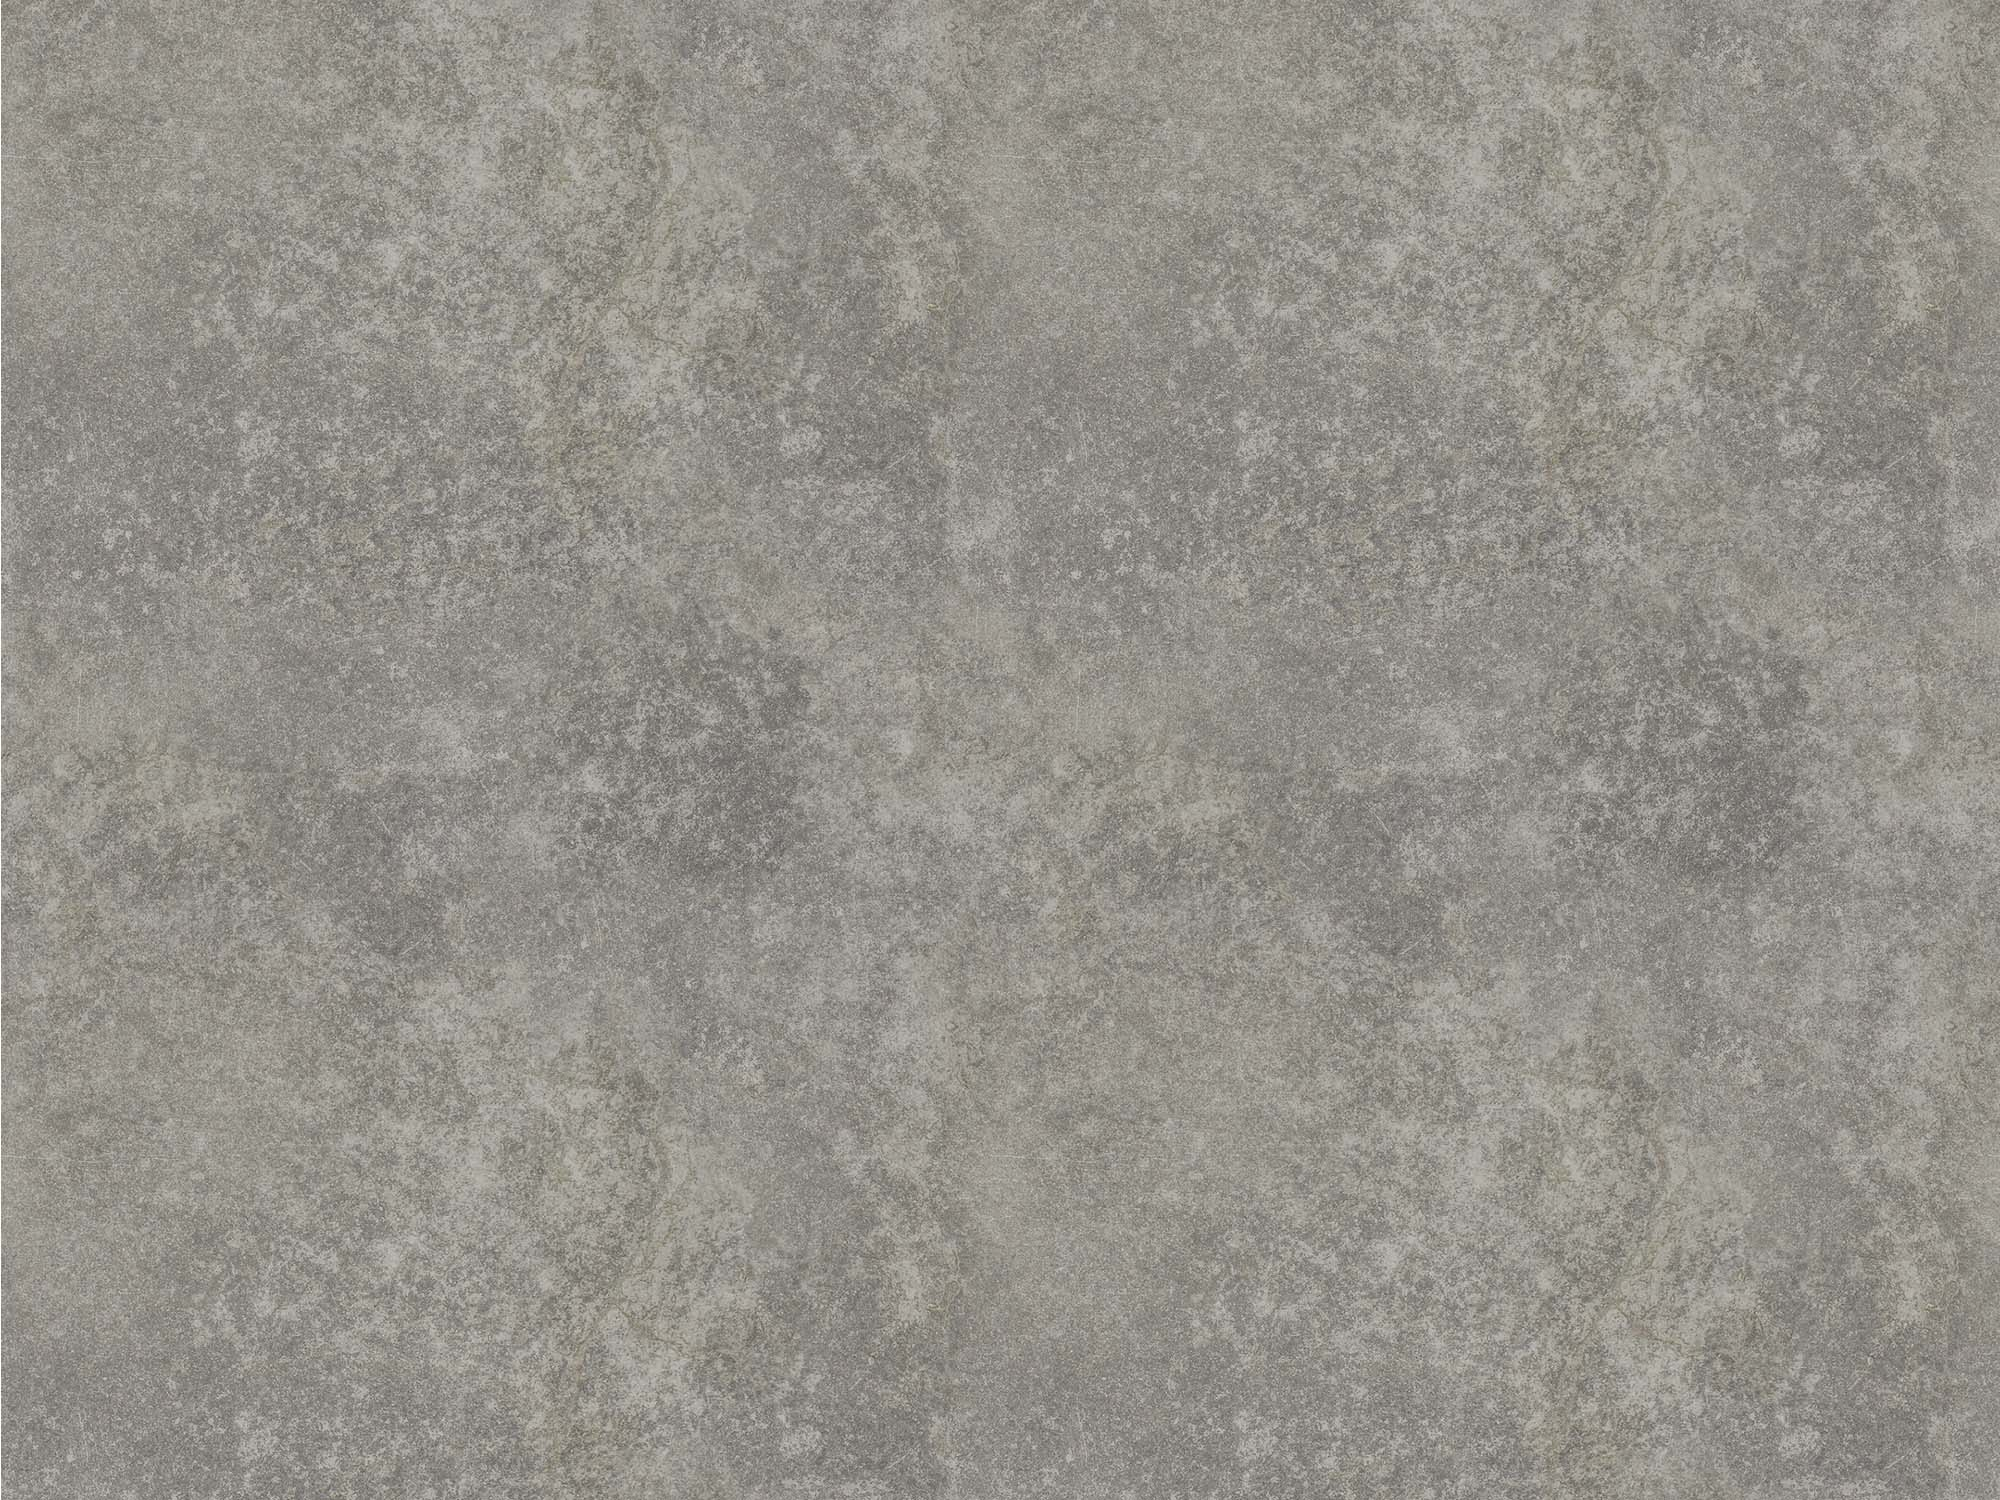 Seamless Concrete Wall Textures 2